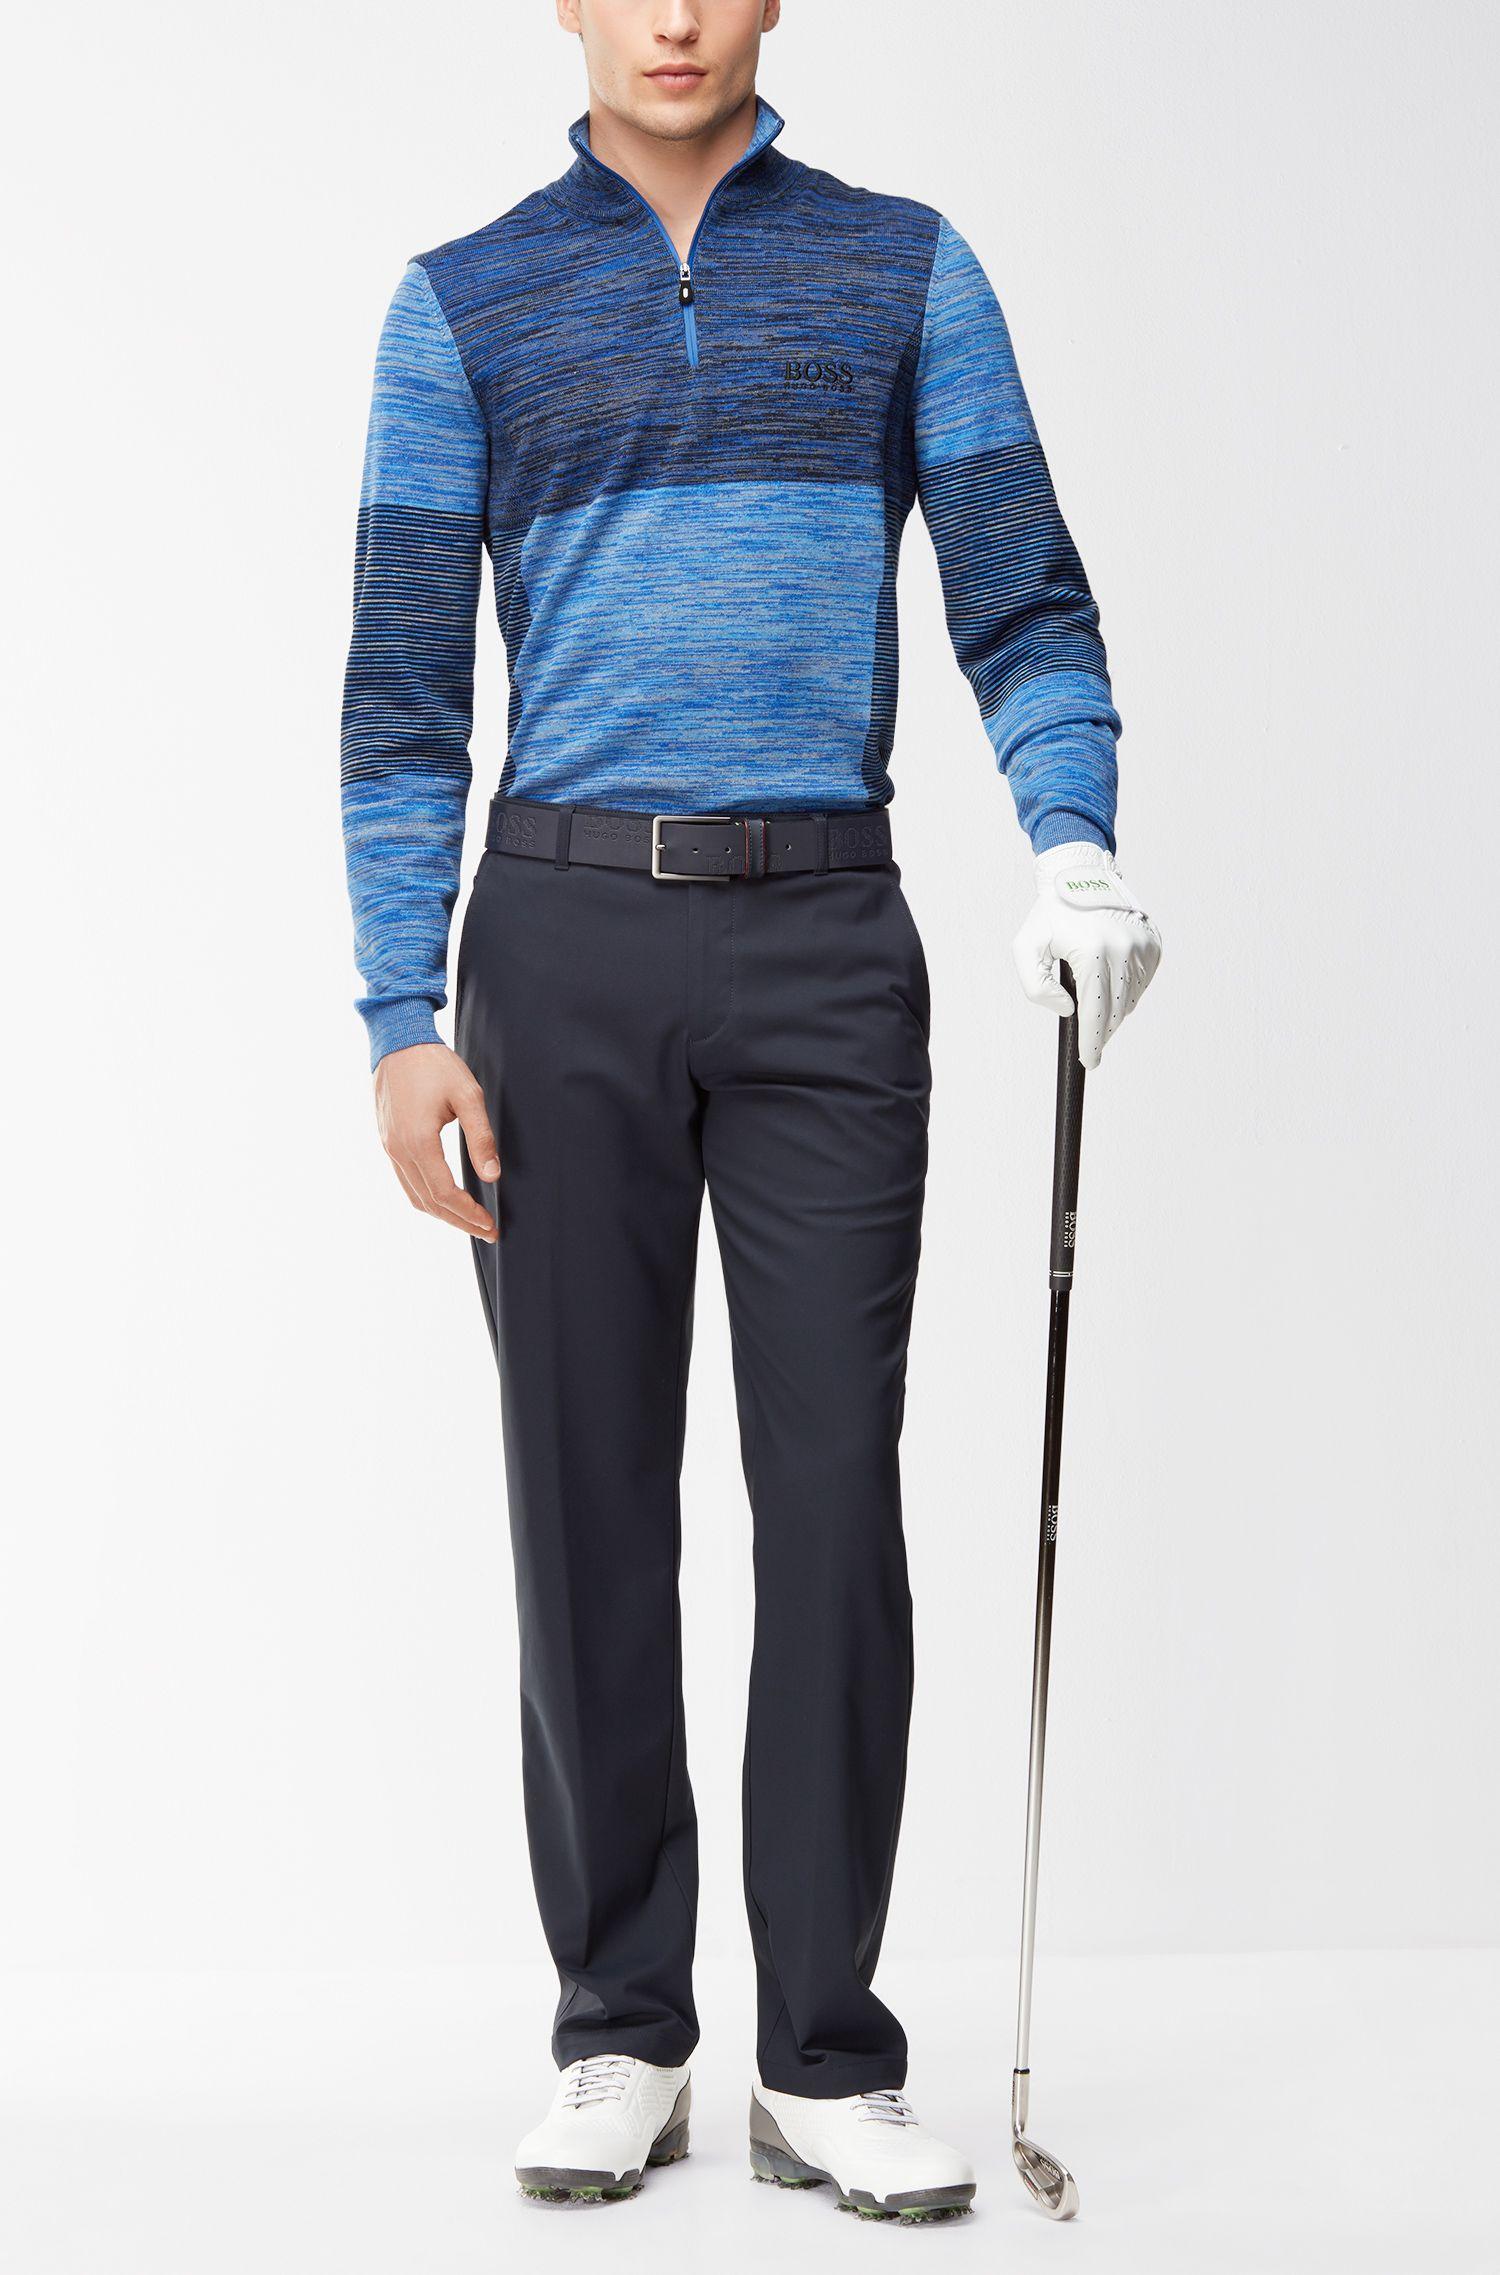 Colorblocked Melange Stretch Cotton Half-Zip Sweater   Zadok Pro, Blue